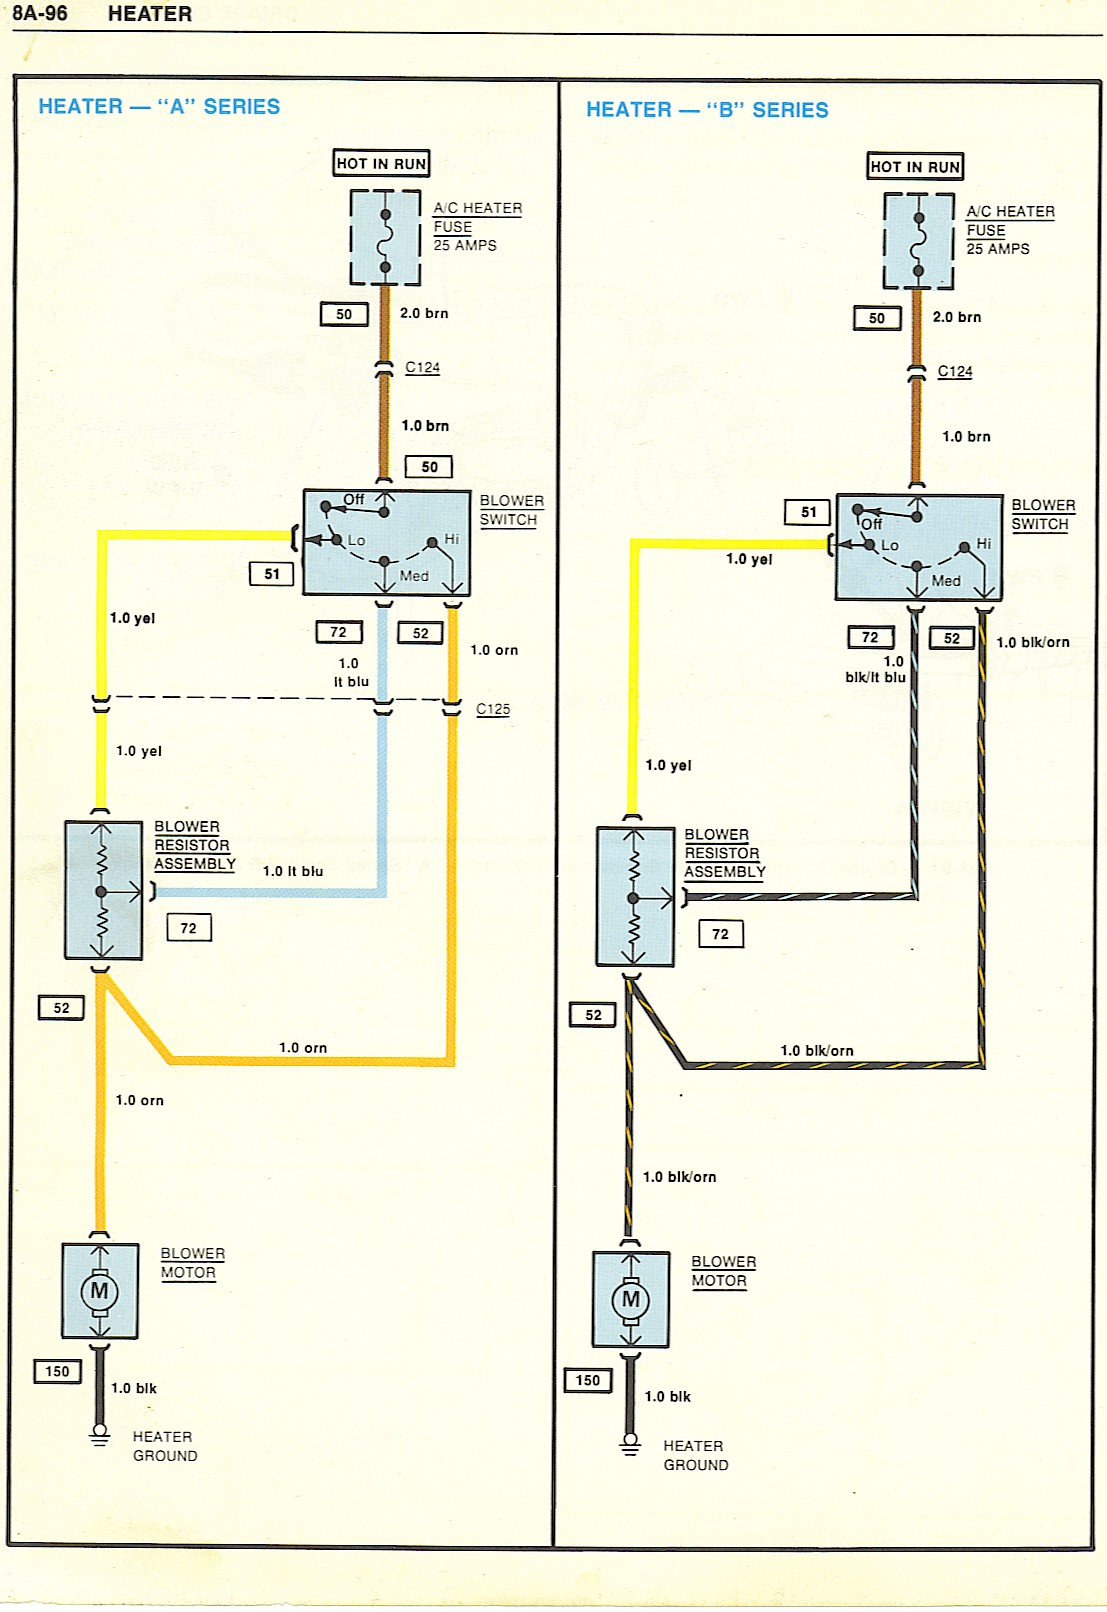 Heater?resize=665%2C968 afi 500 wiper motor wiring diagram afi 2000 wiper motor toyota winshield wiper motor wiring diagram at soozxer.org